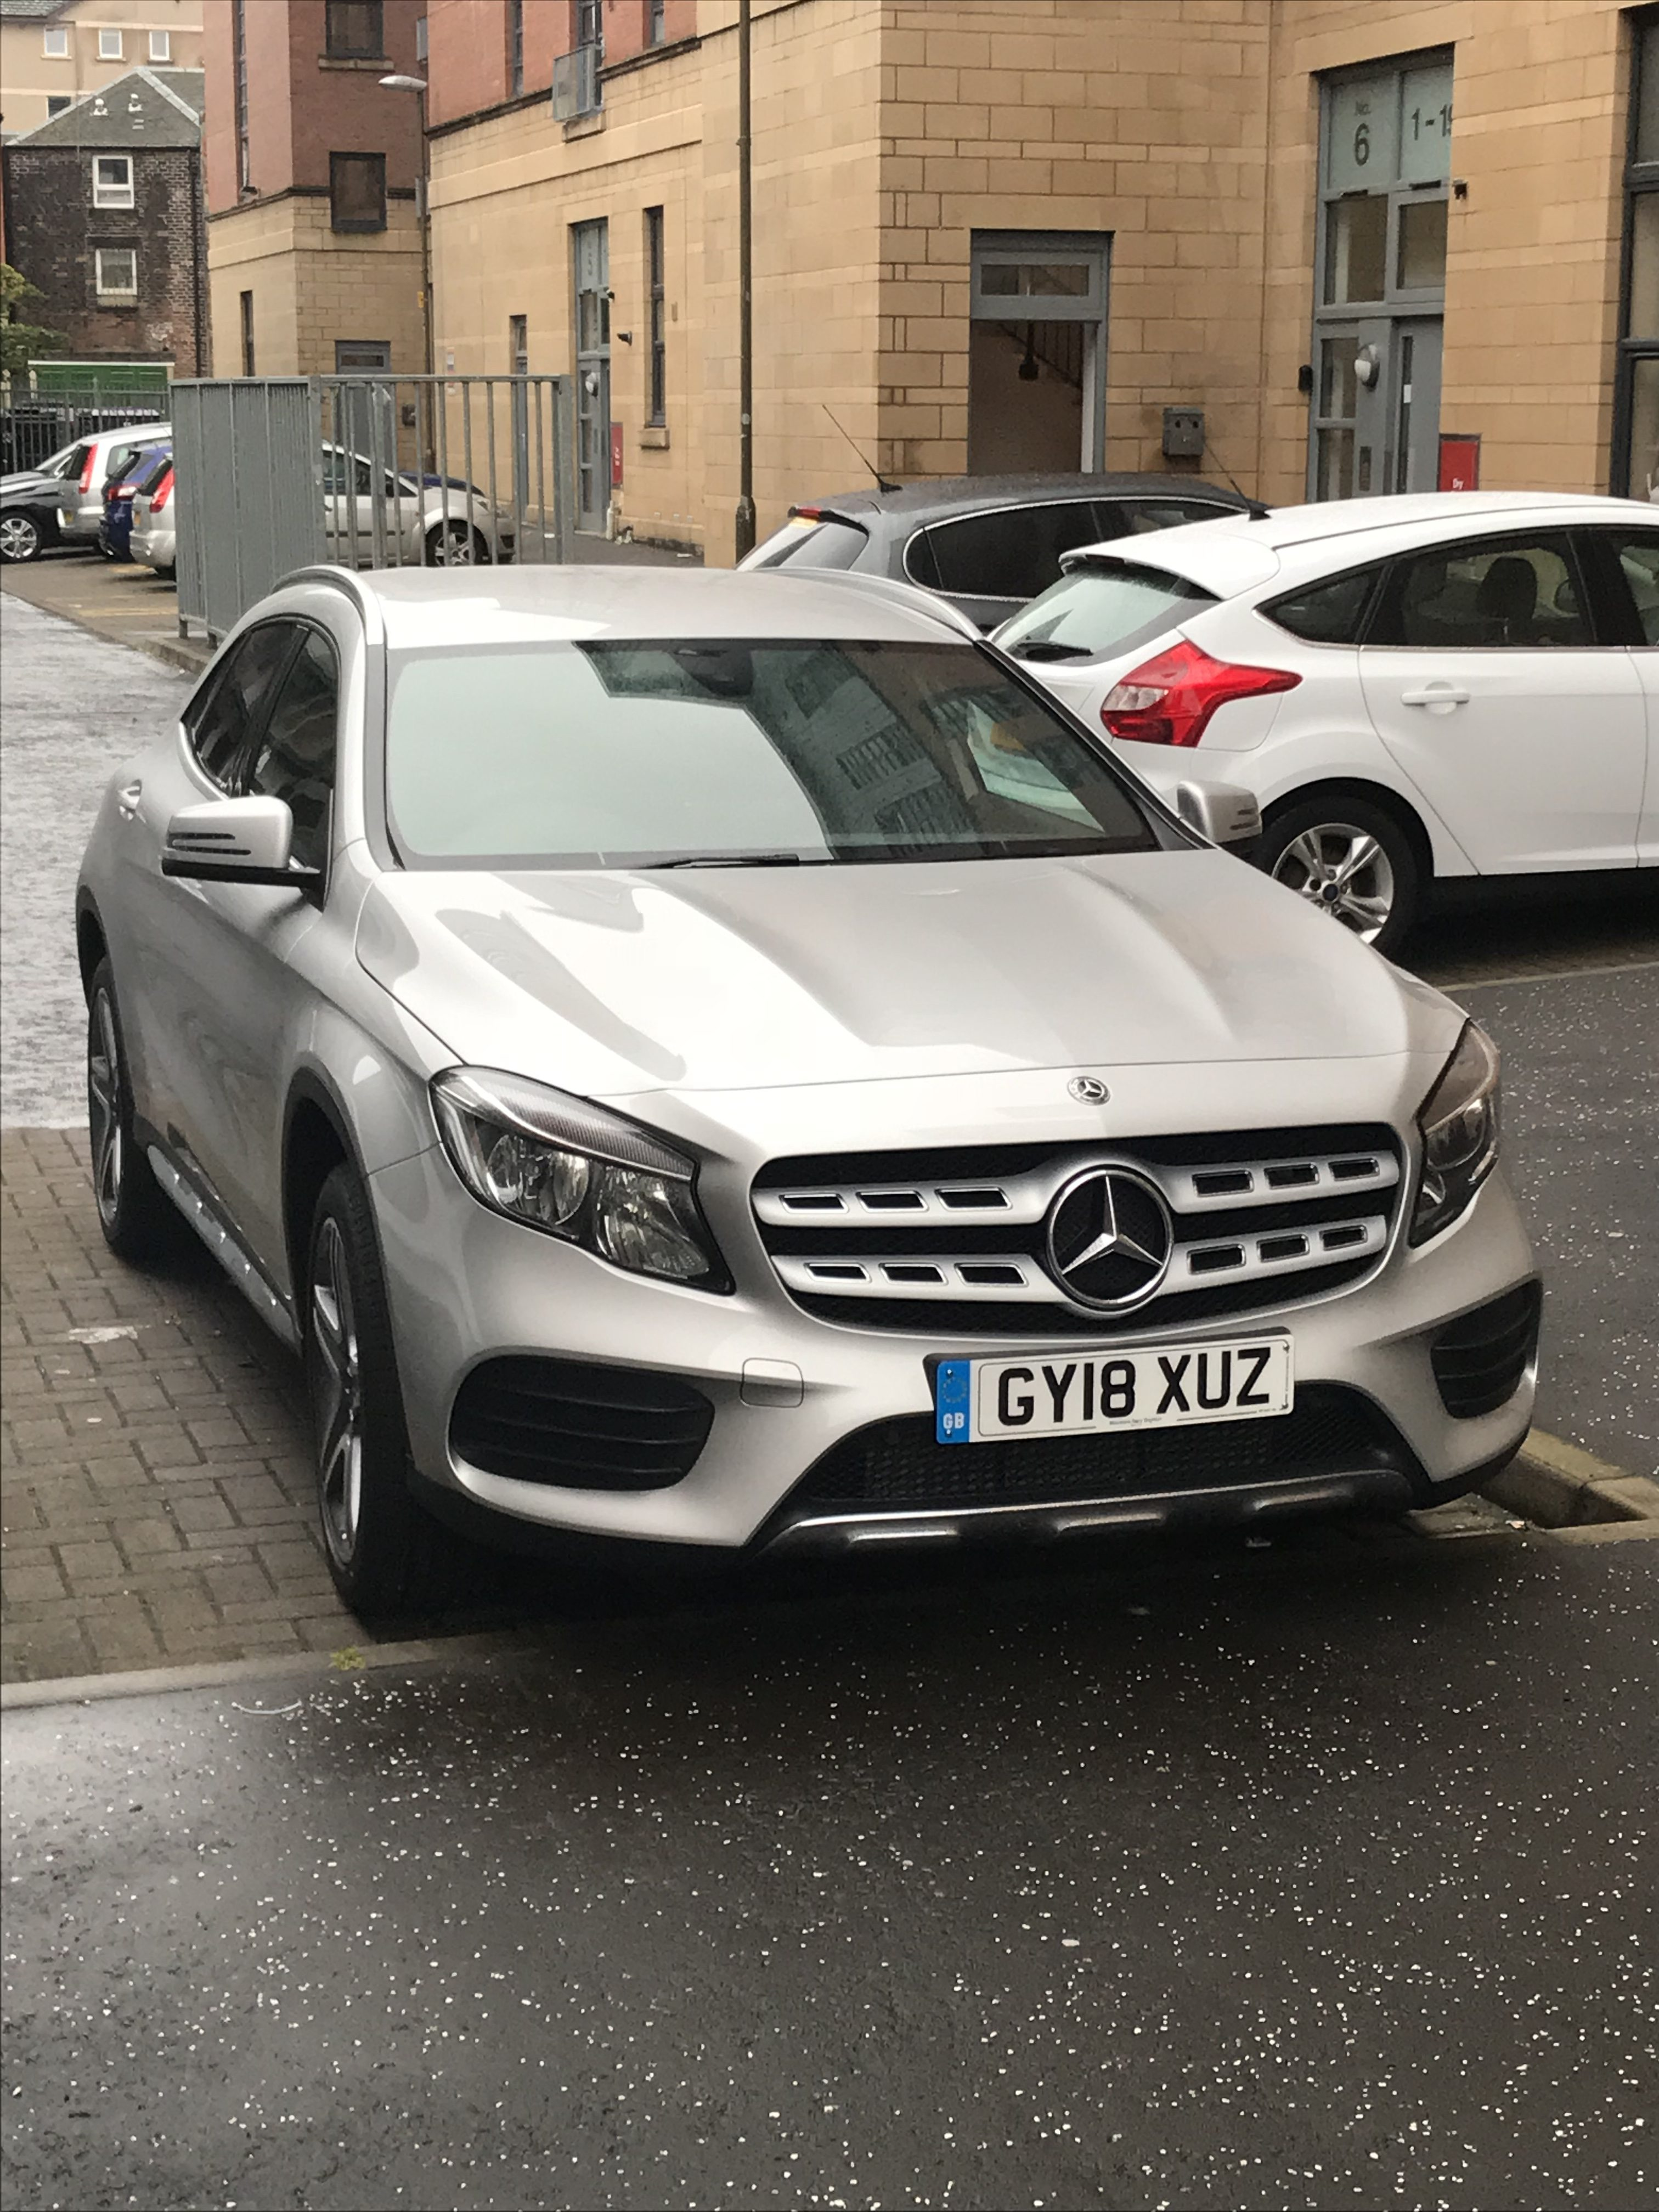 Mercedes-Benz GLA CLASS DIESEL HATCHBACK GLA 200d AMG Line 5dr [Auto] Car Leasing